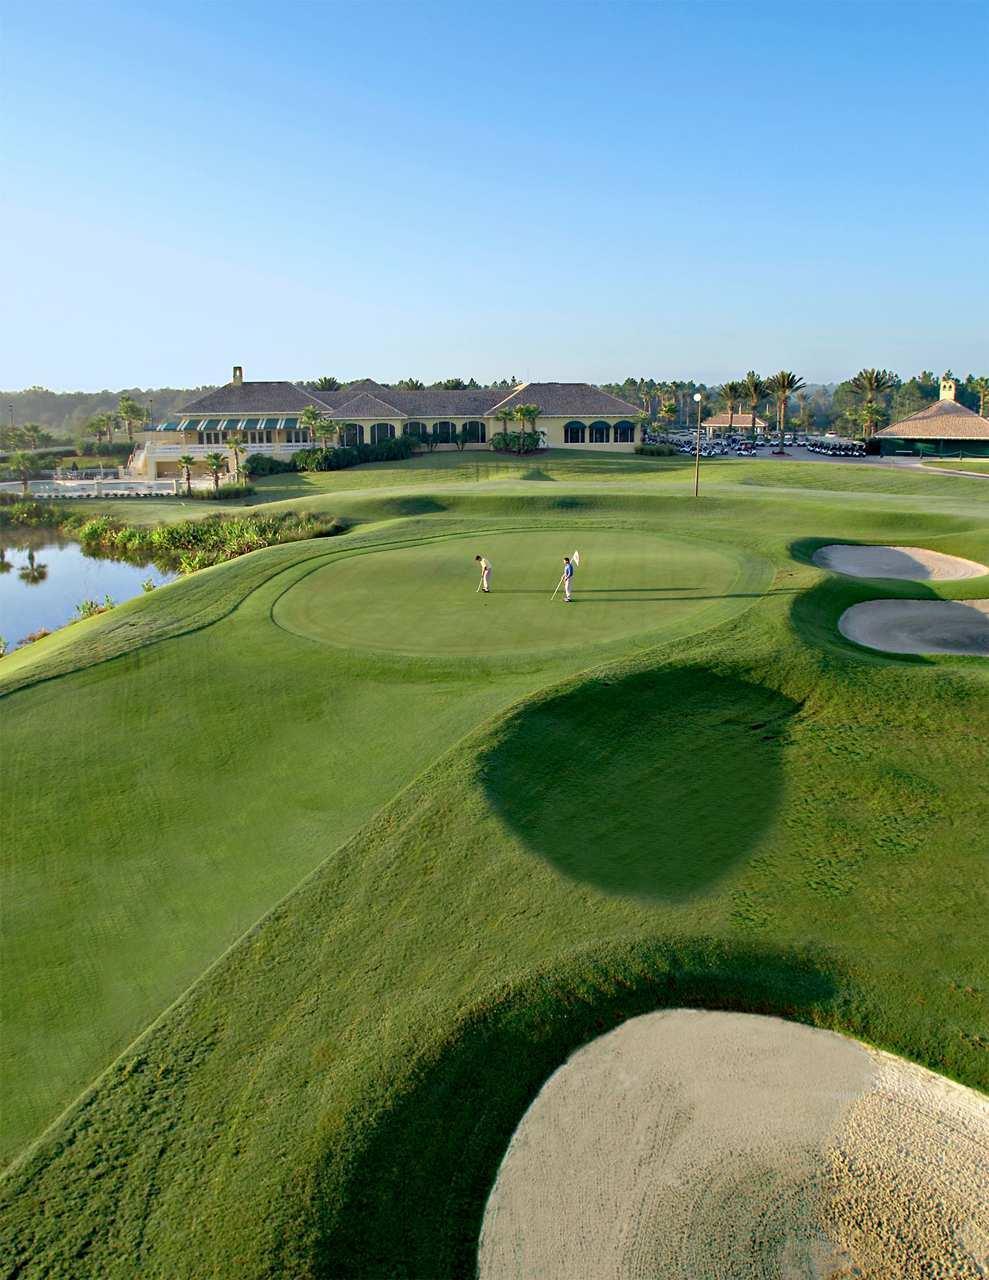 Hilton Daytona Beach Gift Shop, Daytona Beach, FL 32118 - MapQuest